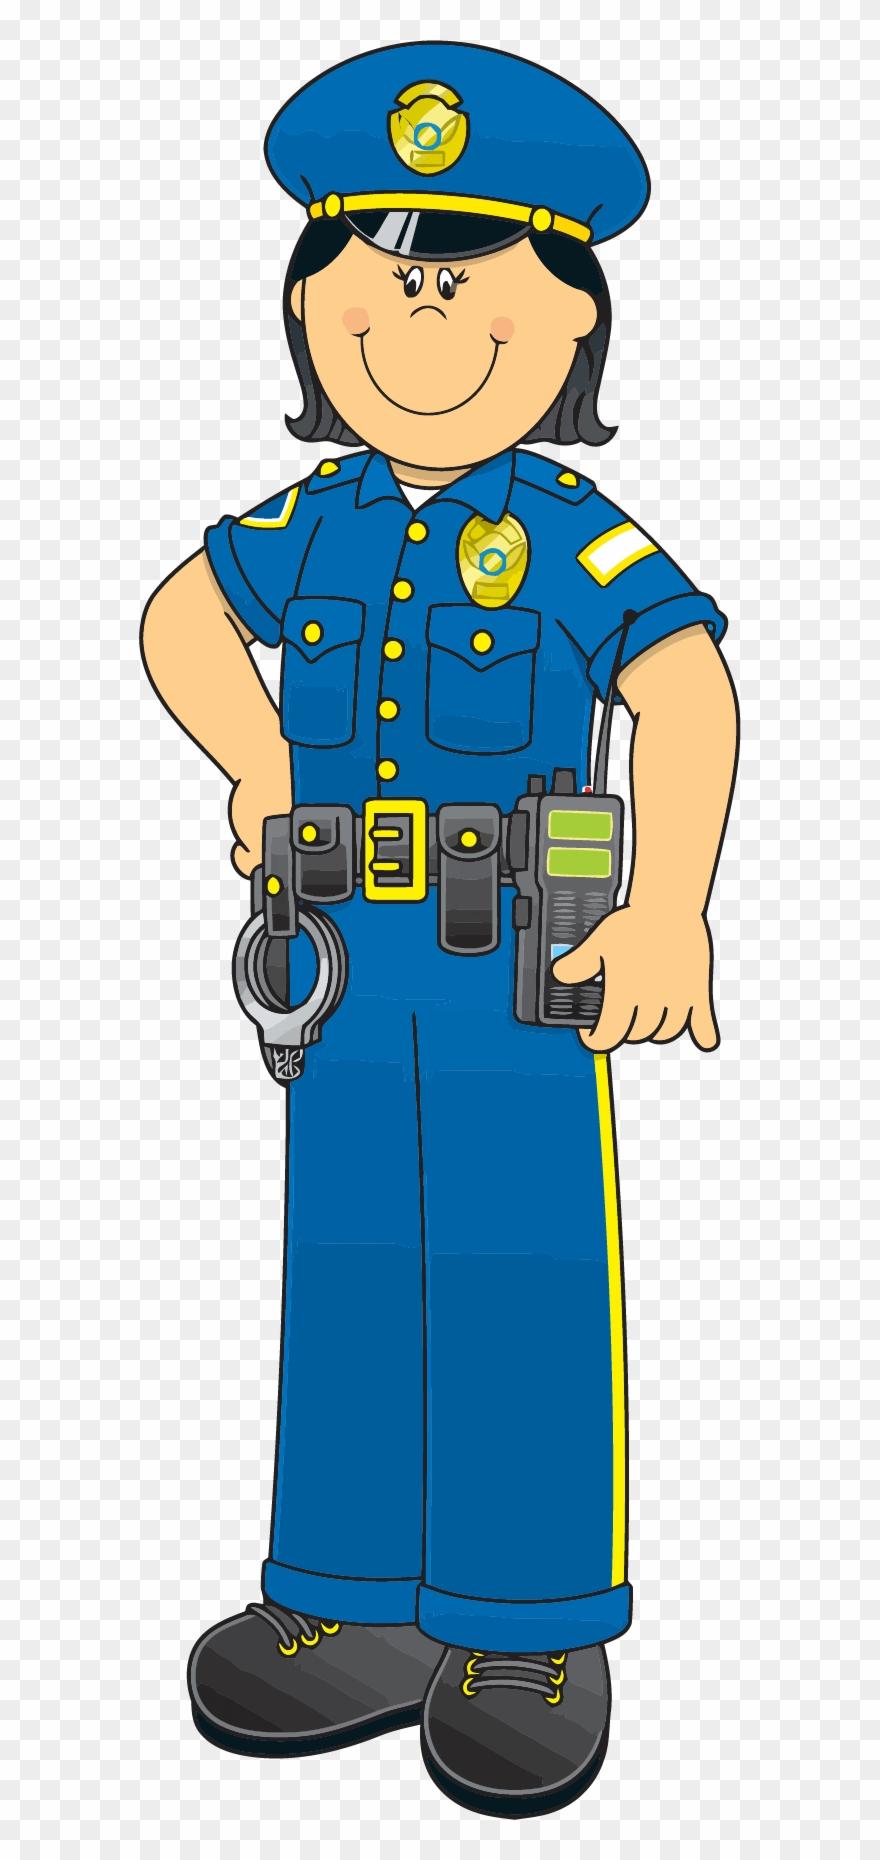 Female Police Officer Clipart.